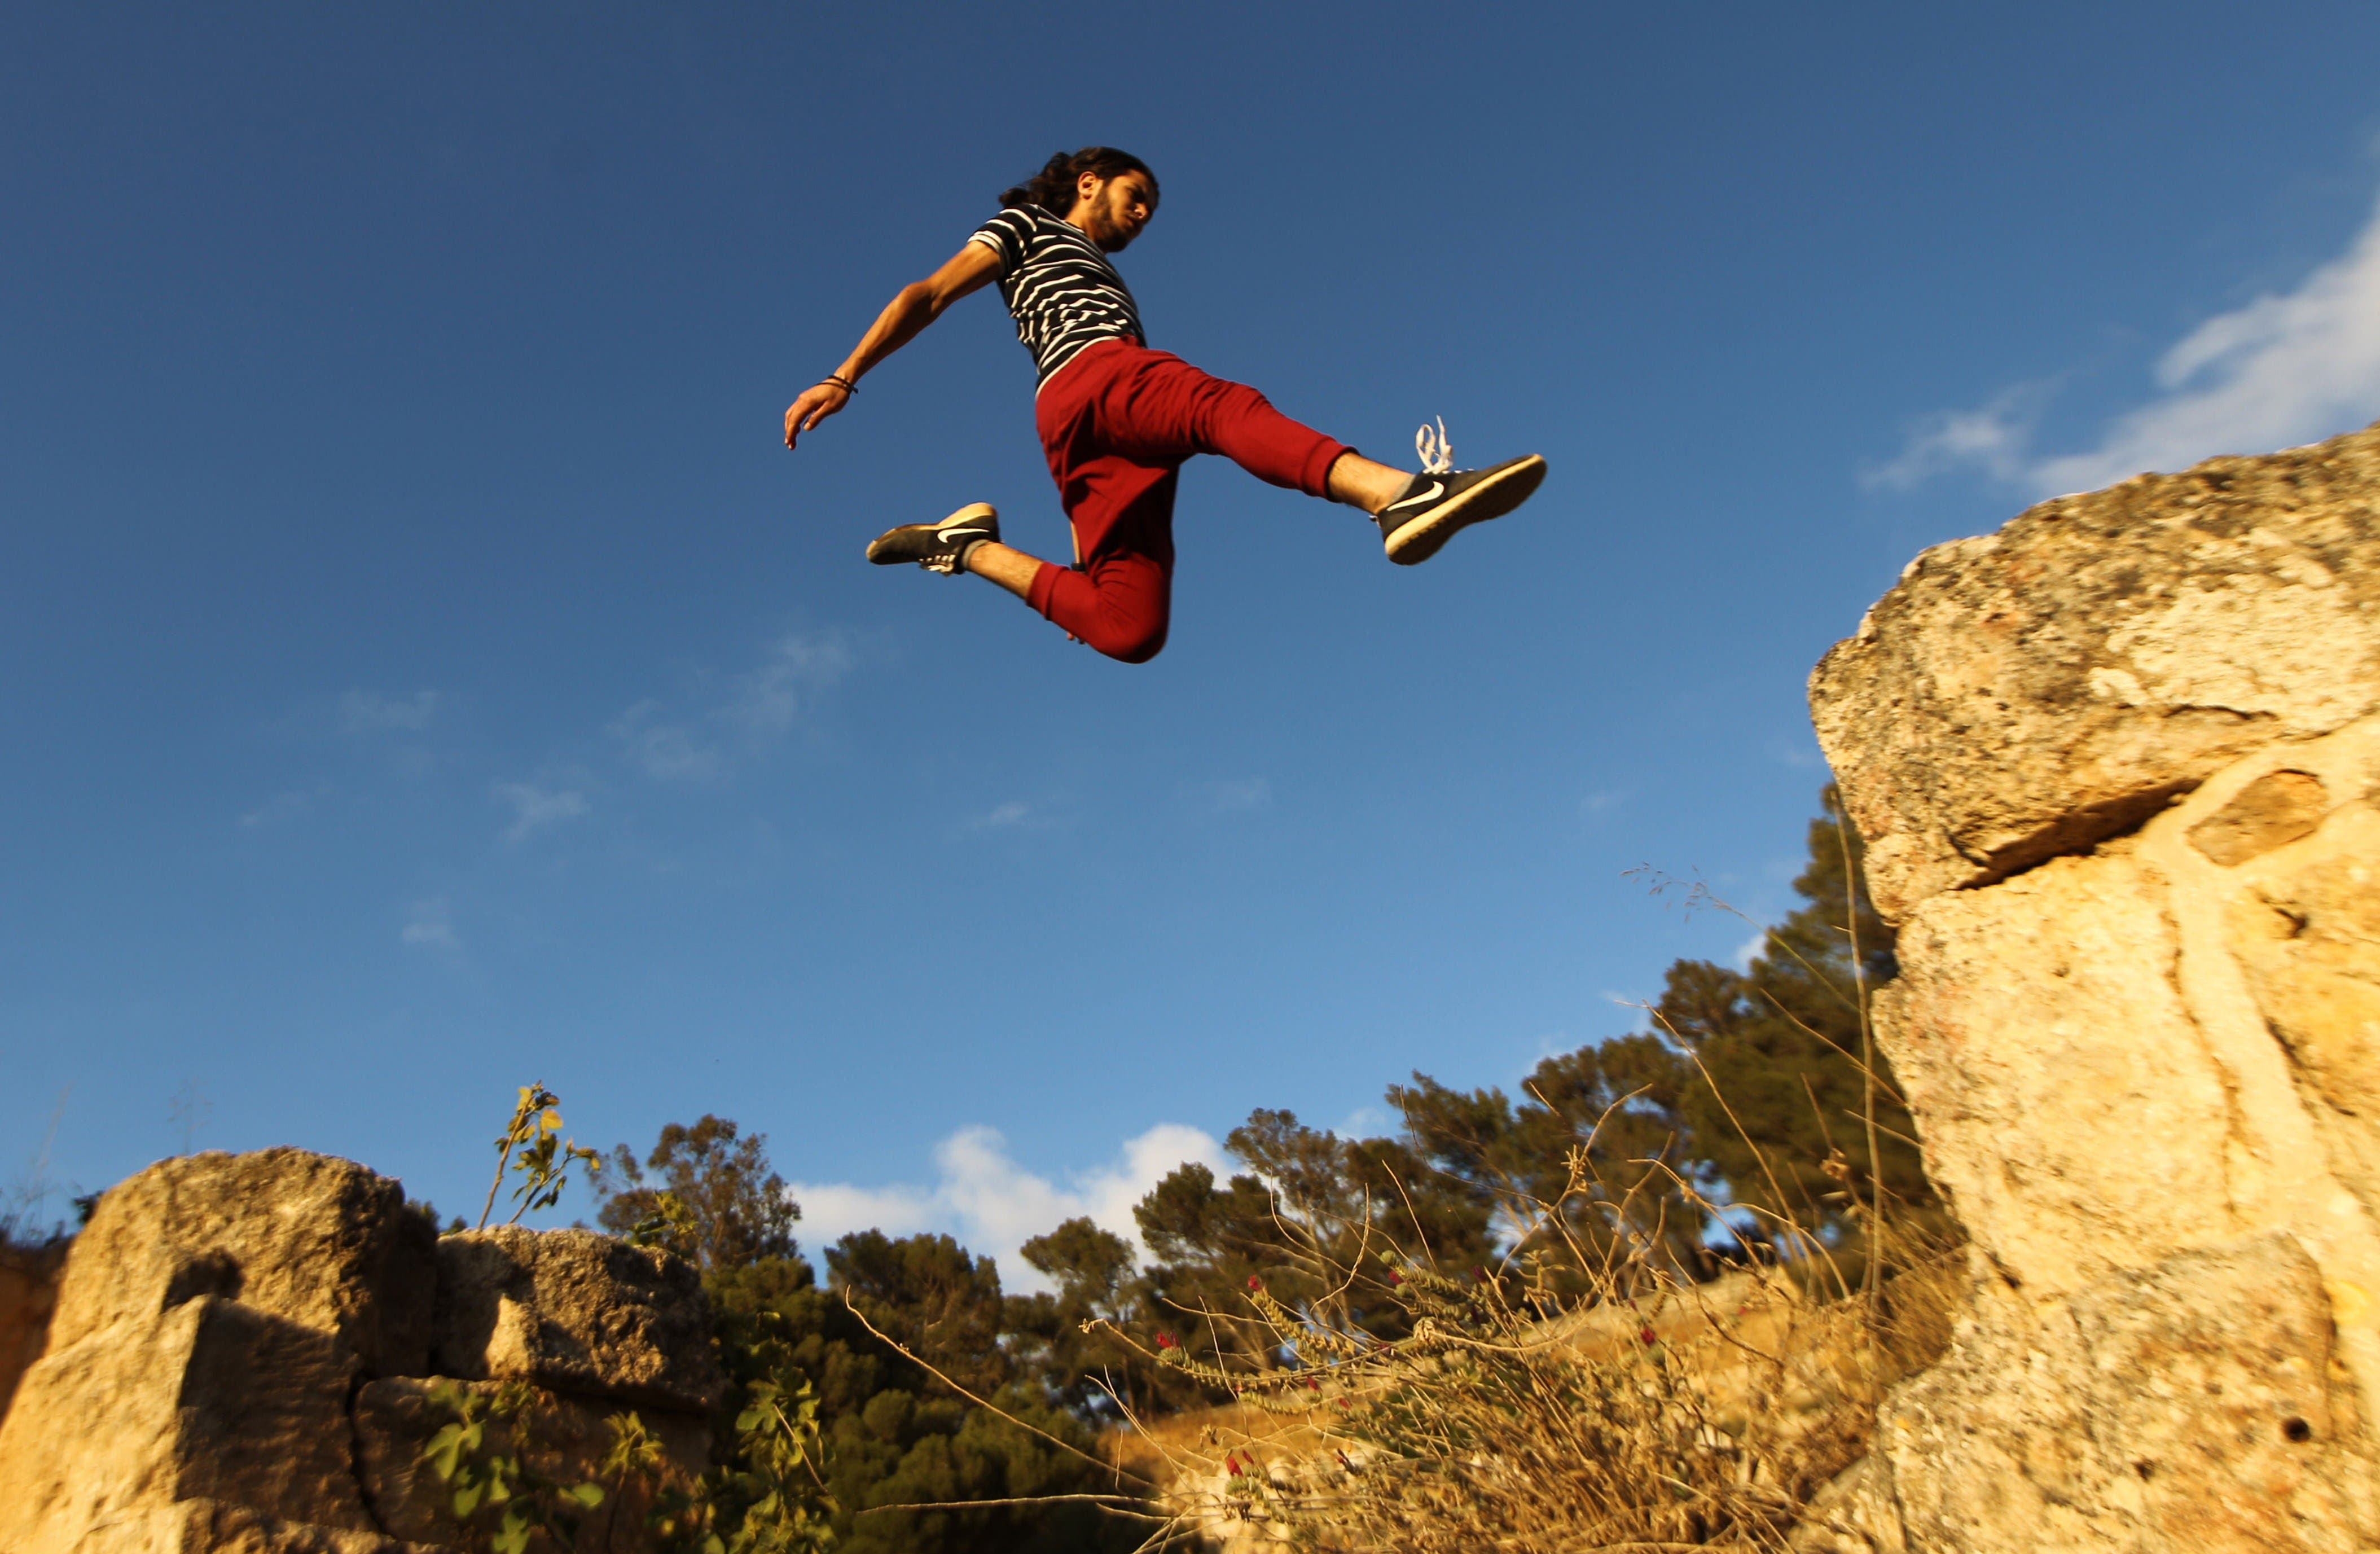 Parkour fun in Libya